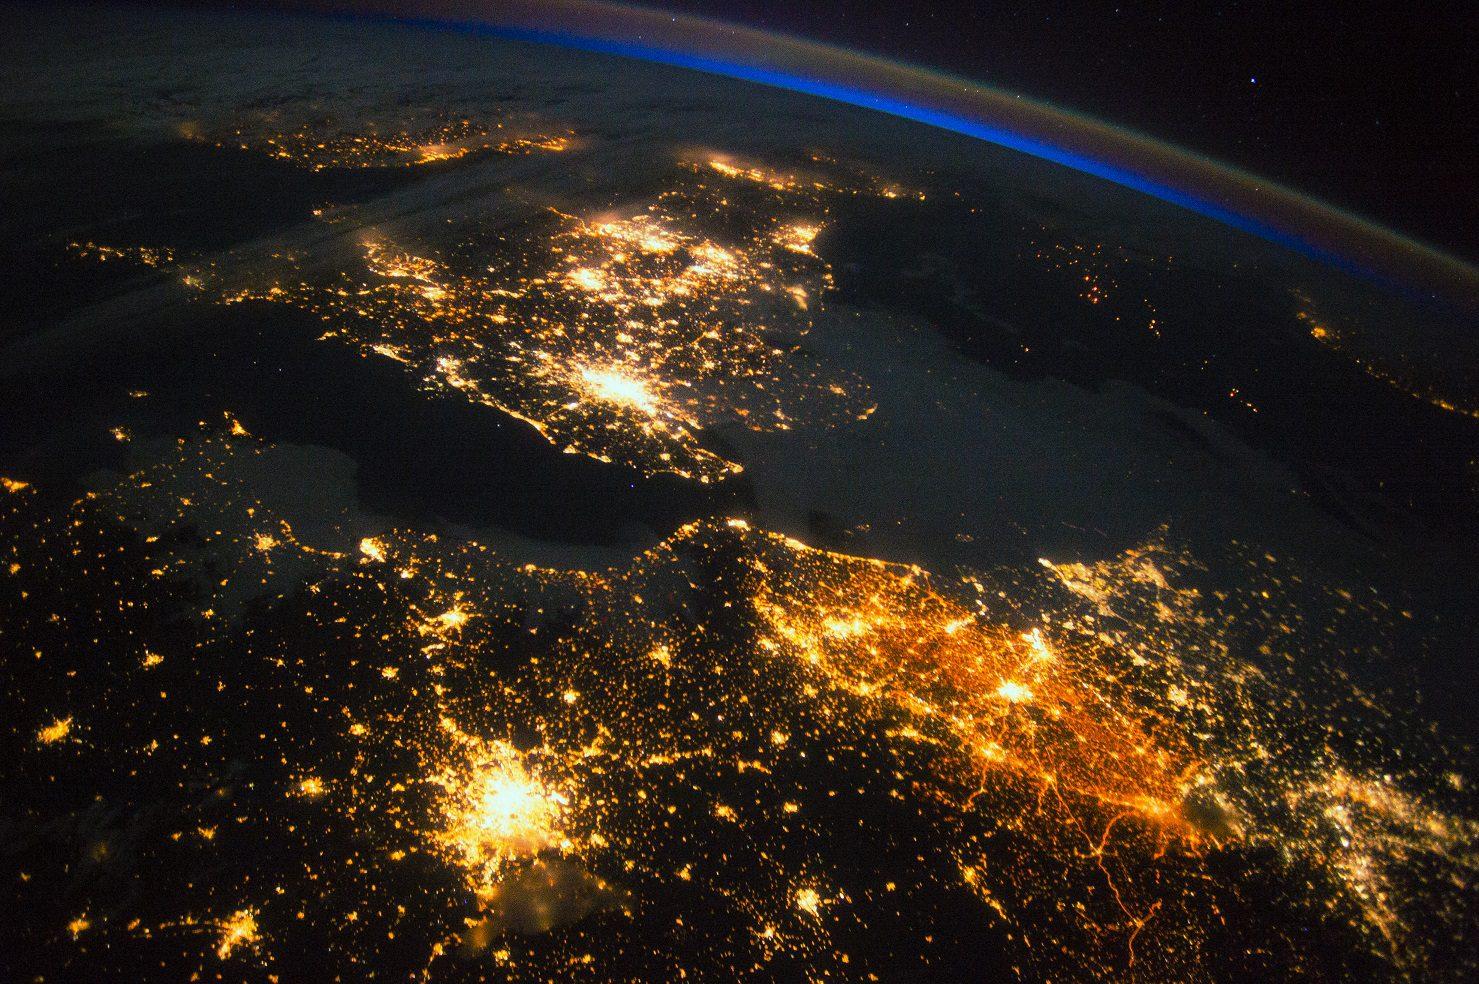 UK and Europe at night from space. Credit: Nasa